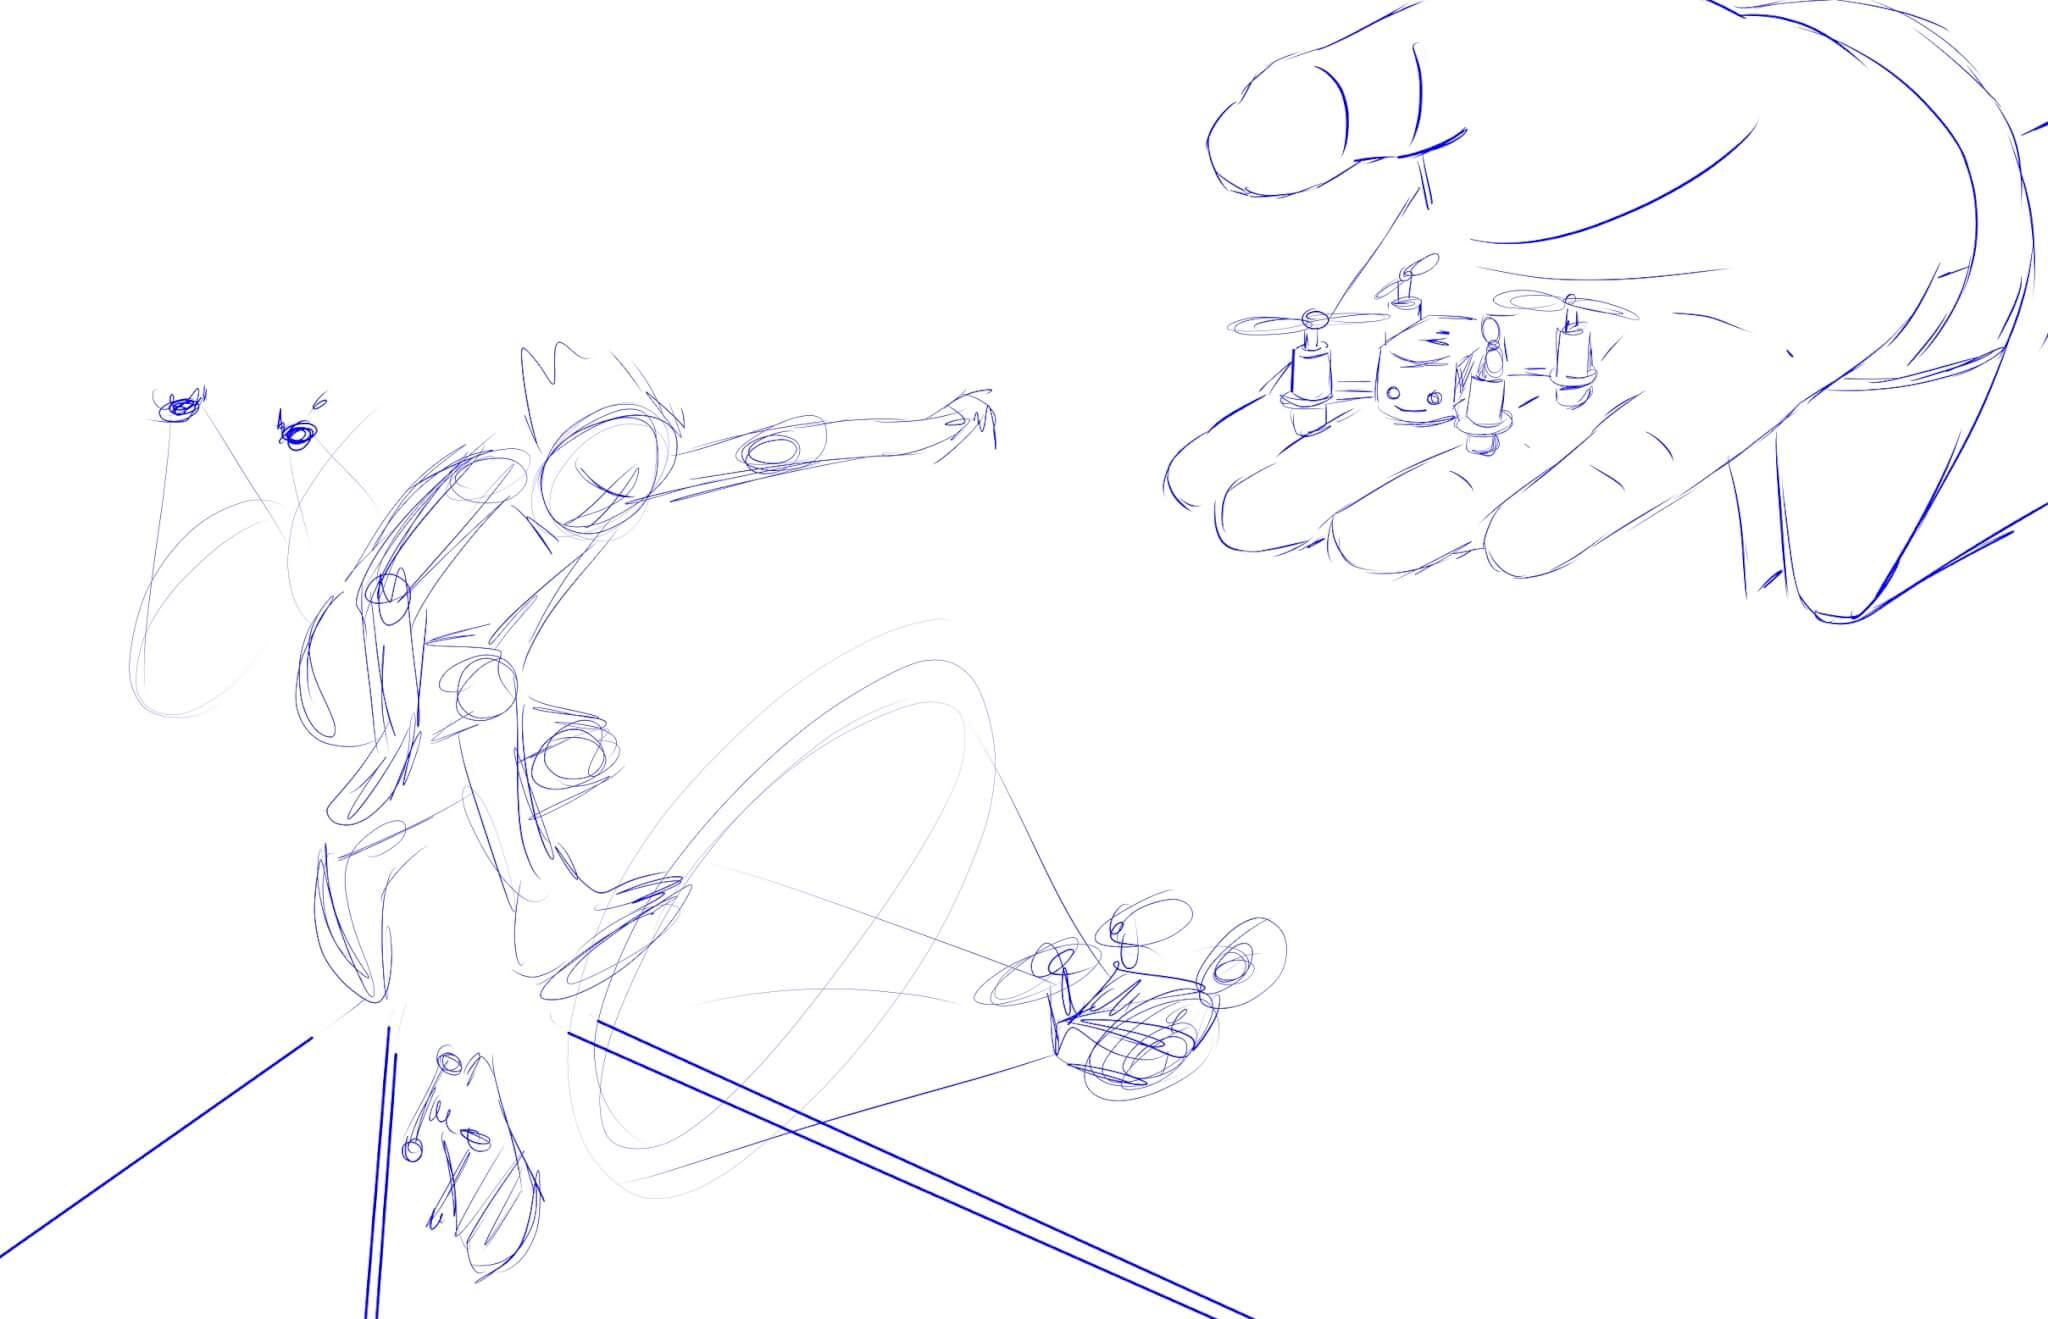 04_minidrone